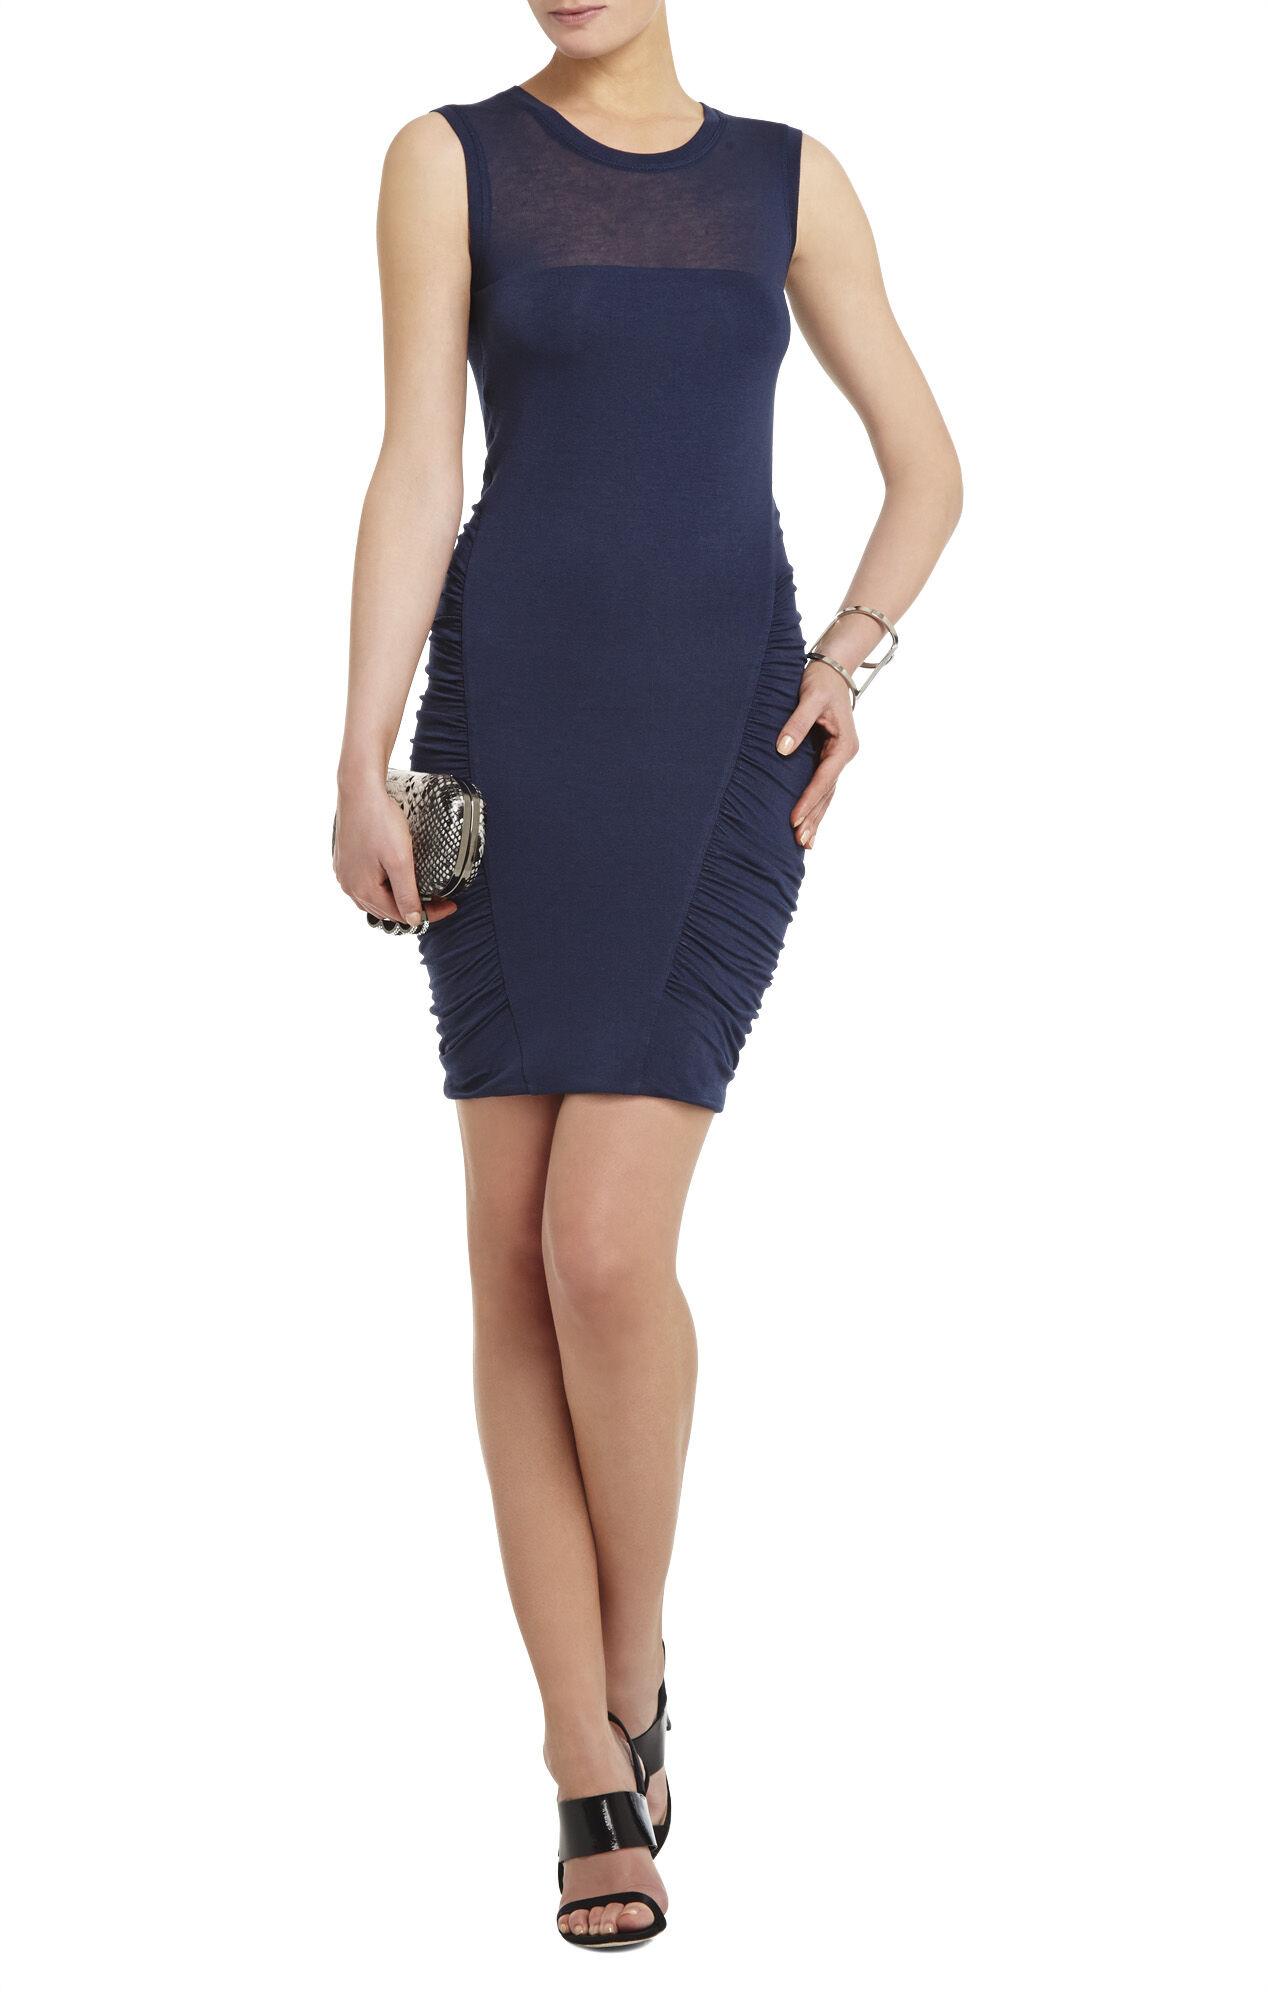 Kenzee Sleeveless Ruched-Skirt Dress